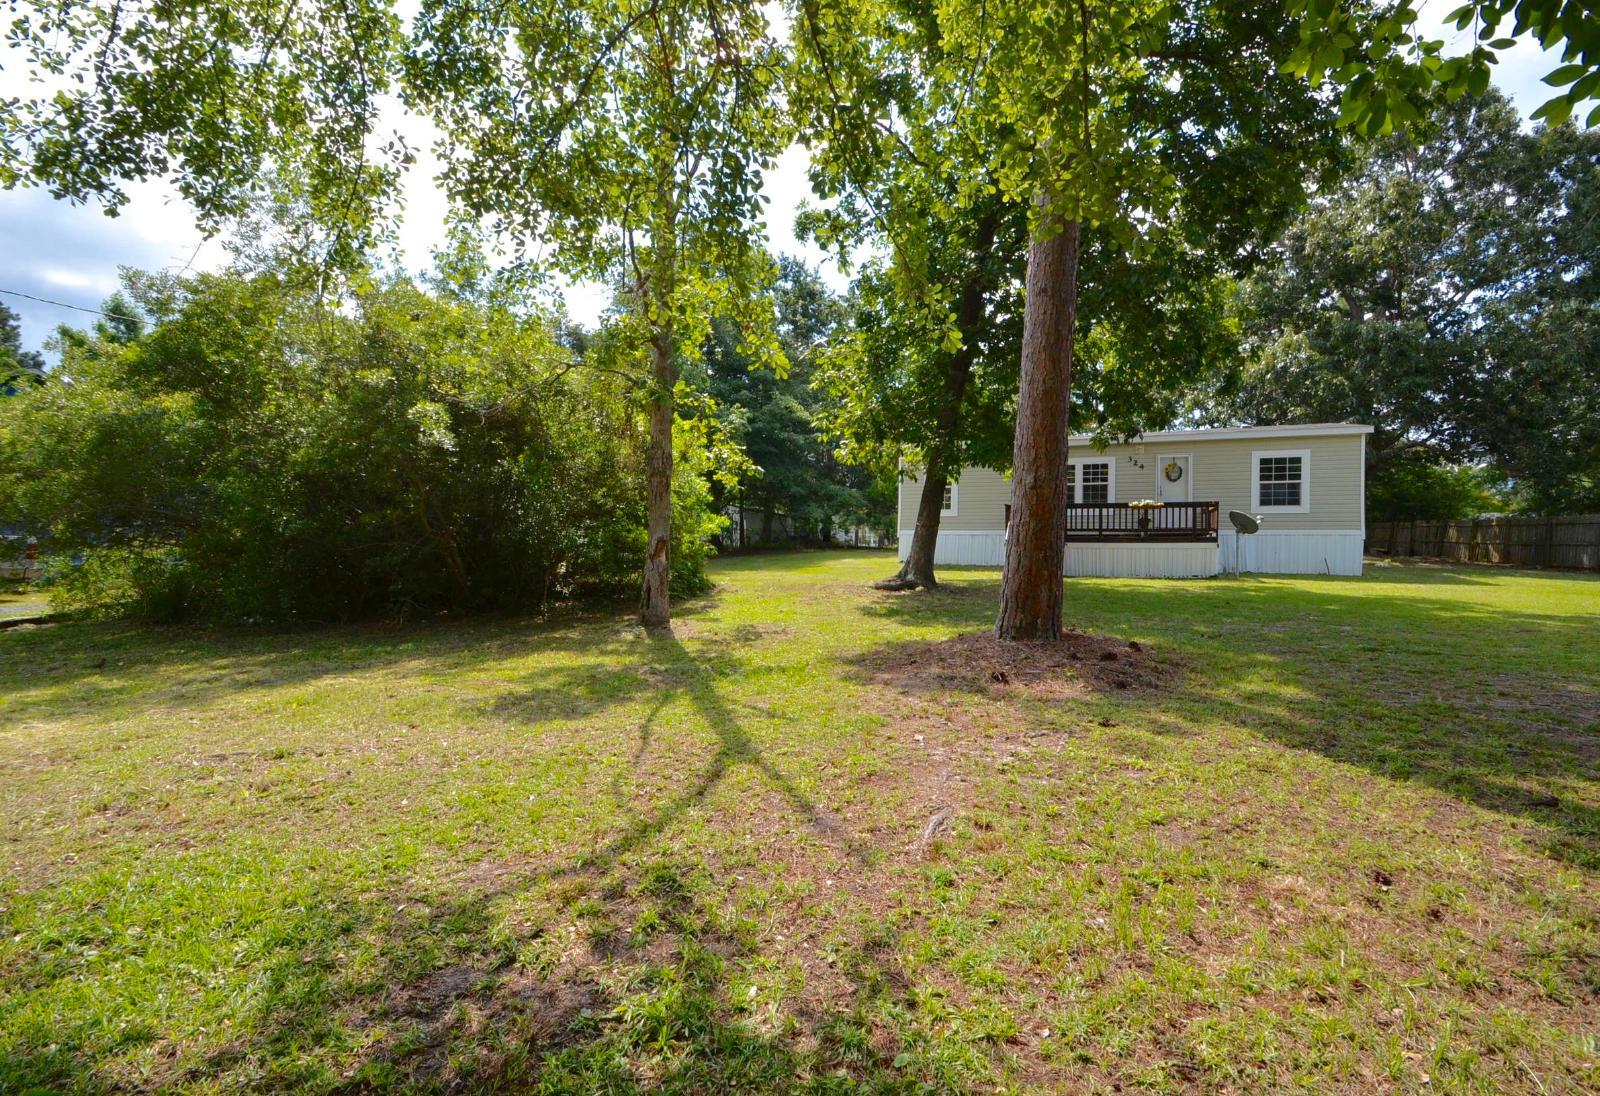 Local Real Estate: Homes for Sale — Bonneau, SC — Coldwell